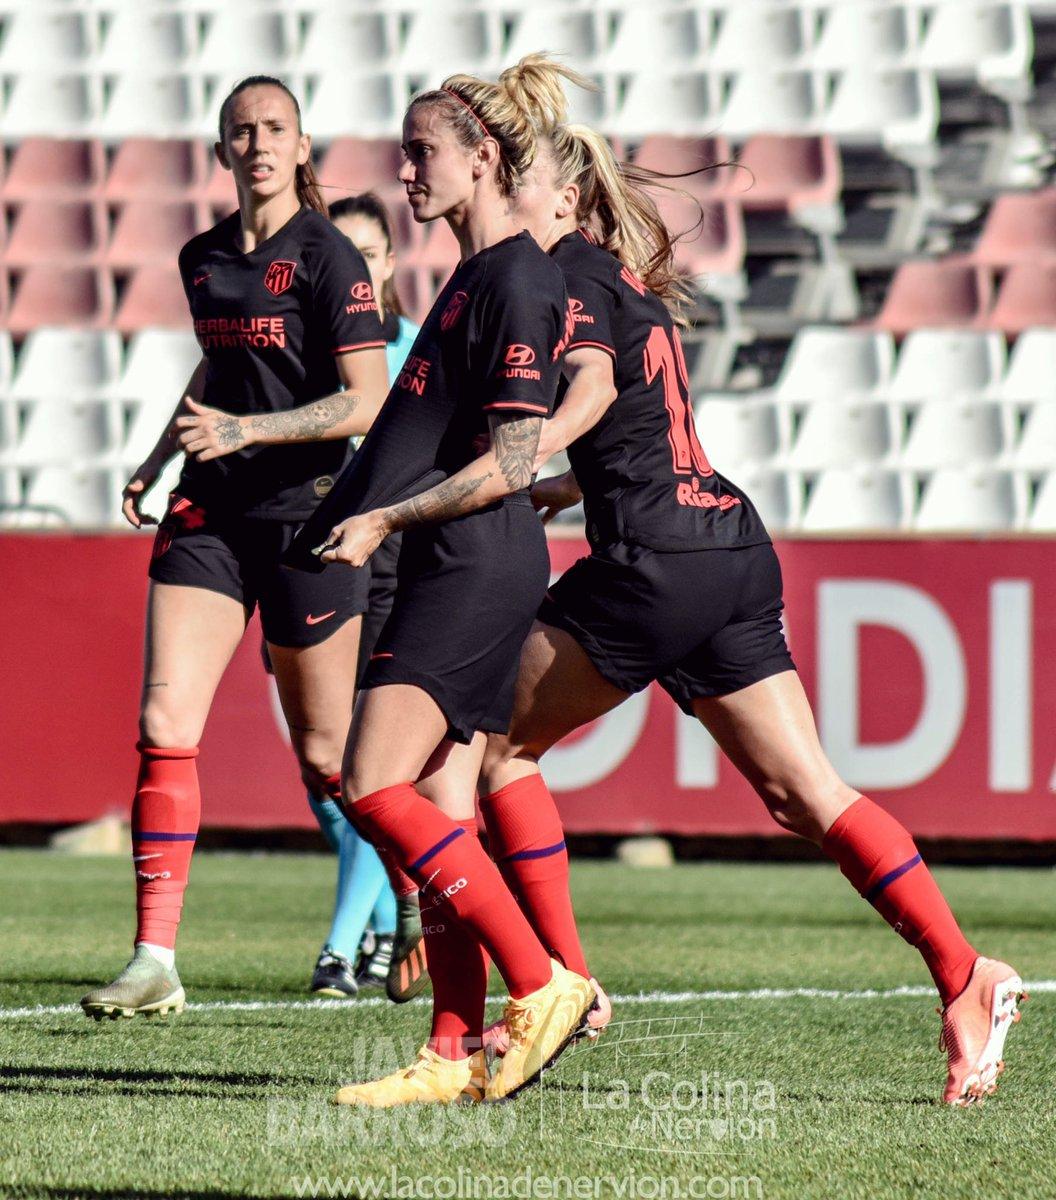 🔴⚪️ #teamwass #pumafootball #pumaone #siempreatleti #crownnutrition #prokeydrinks https://t.co/dv789fWxcm